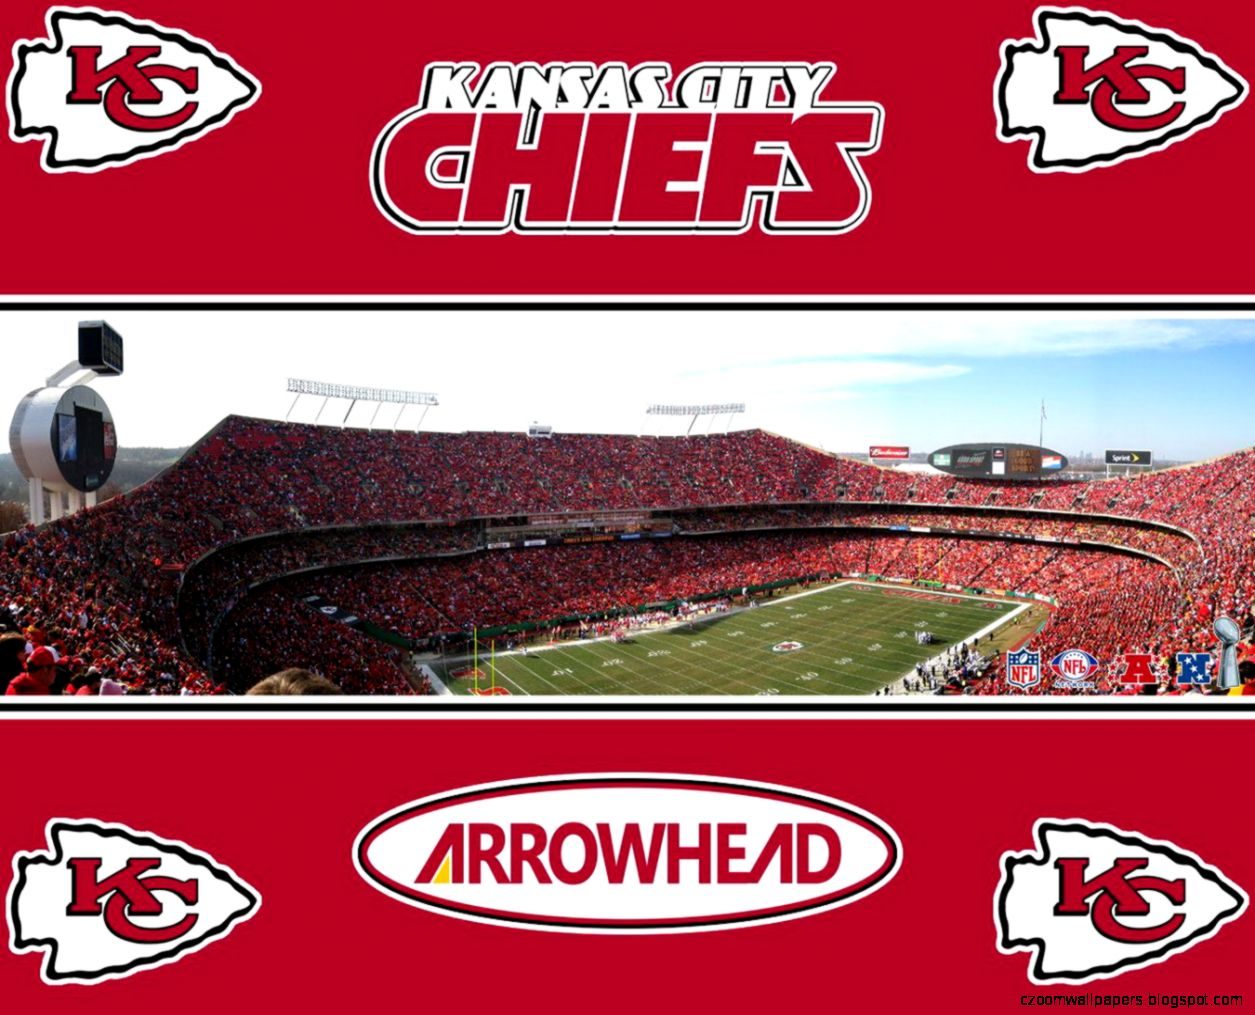 Kansas City Chiefs Arrowhead Stadium Wallpaper